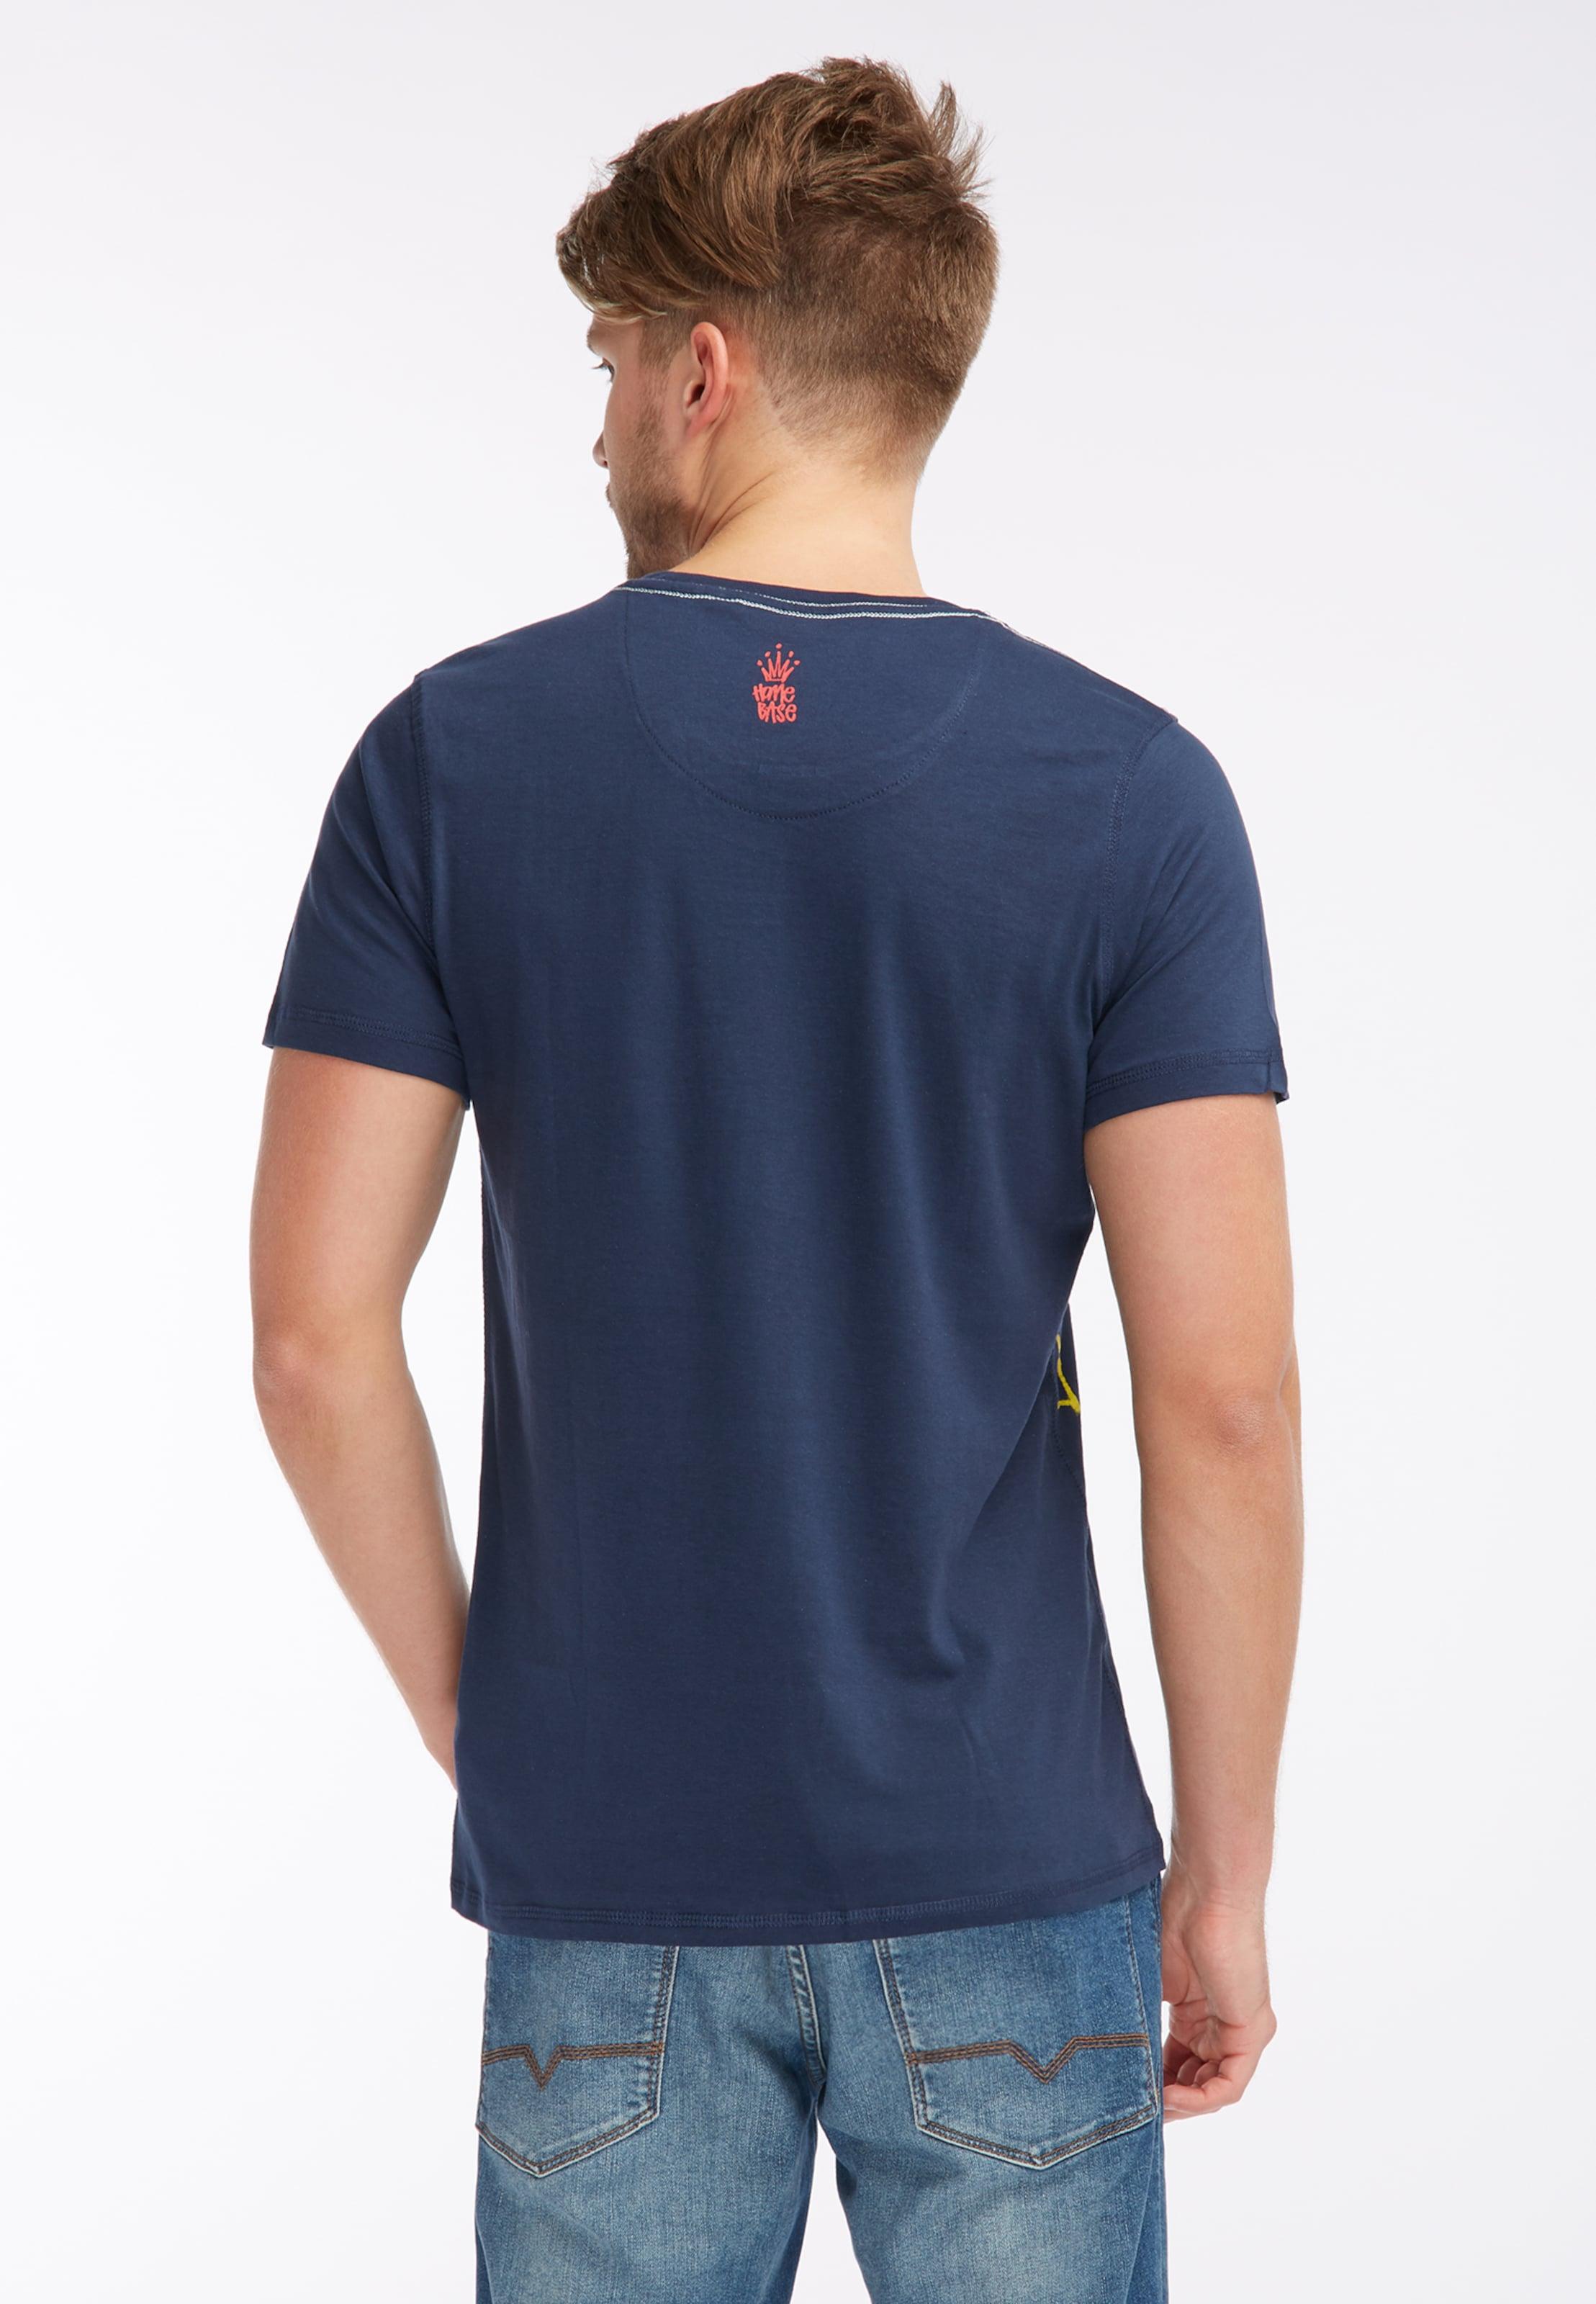 T En Homebase shirt Marine Homebase vN8n0mw